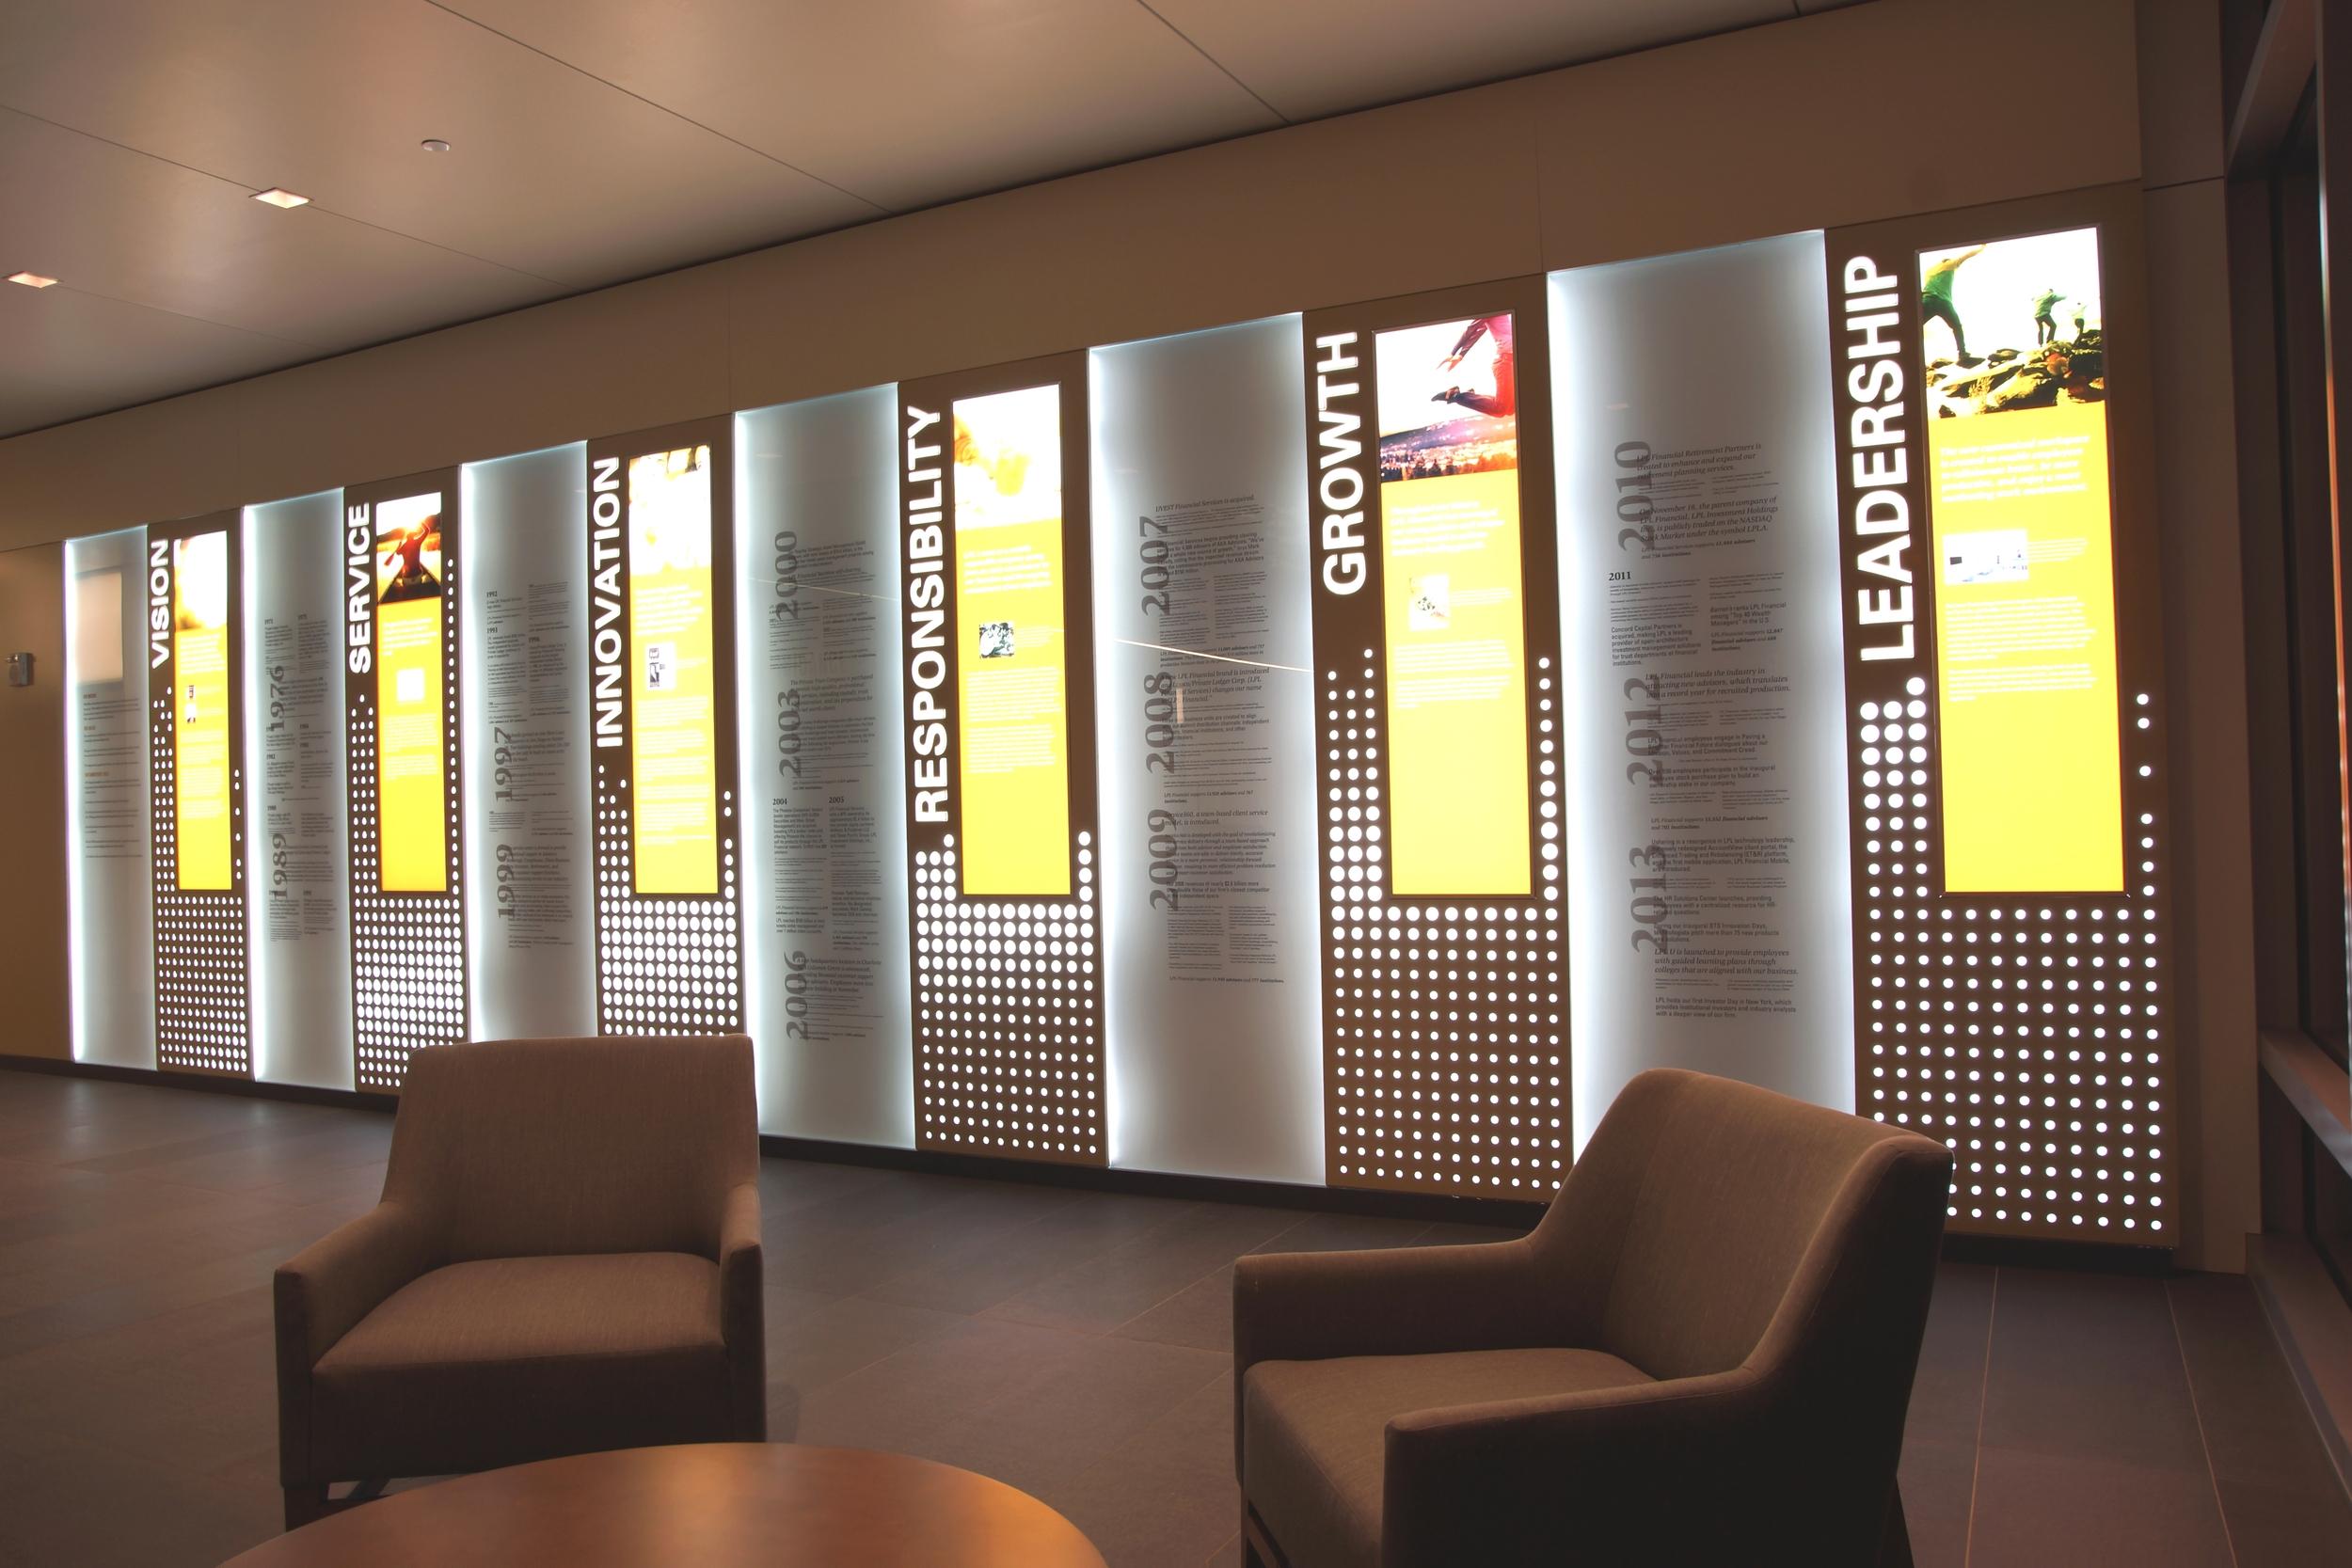 LPL Financial, Corporate Office